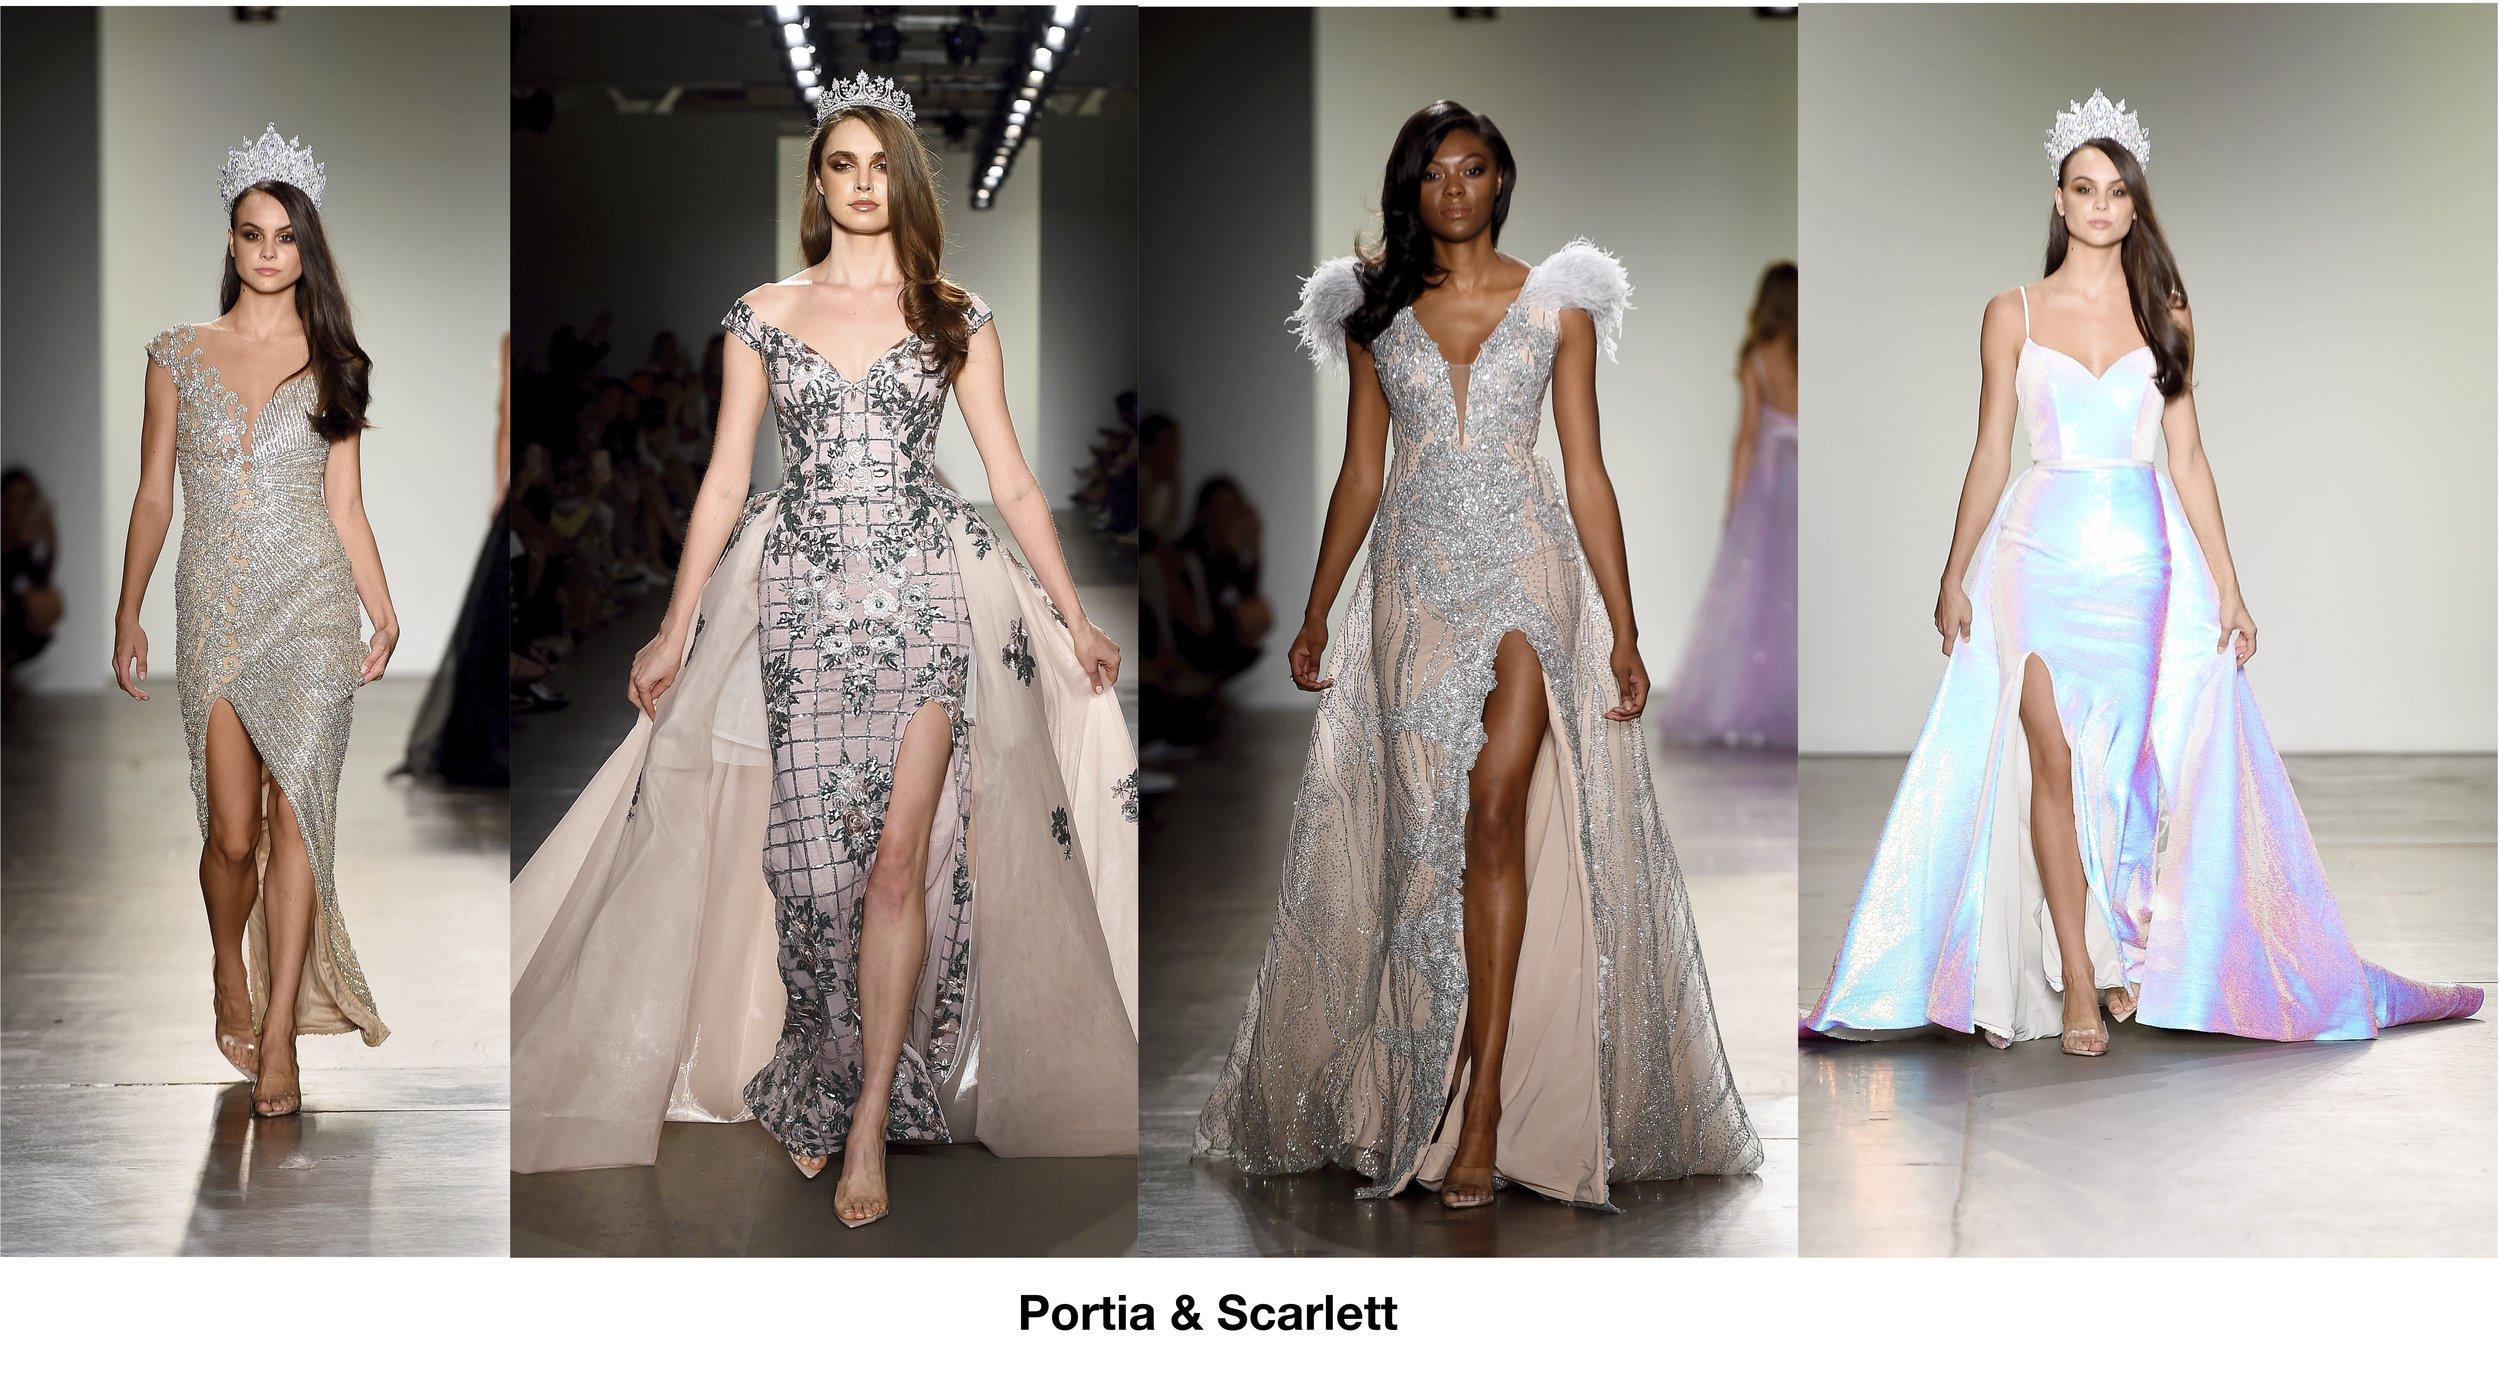 Fashion Palette - Portia & Scarlett.jpg